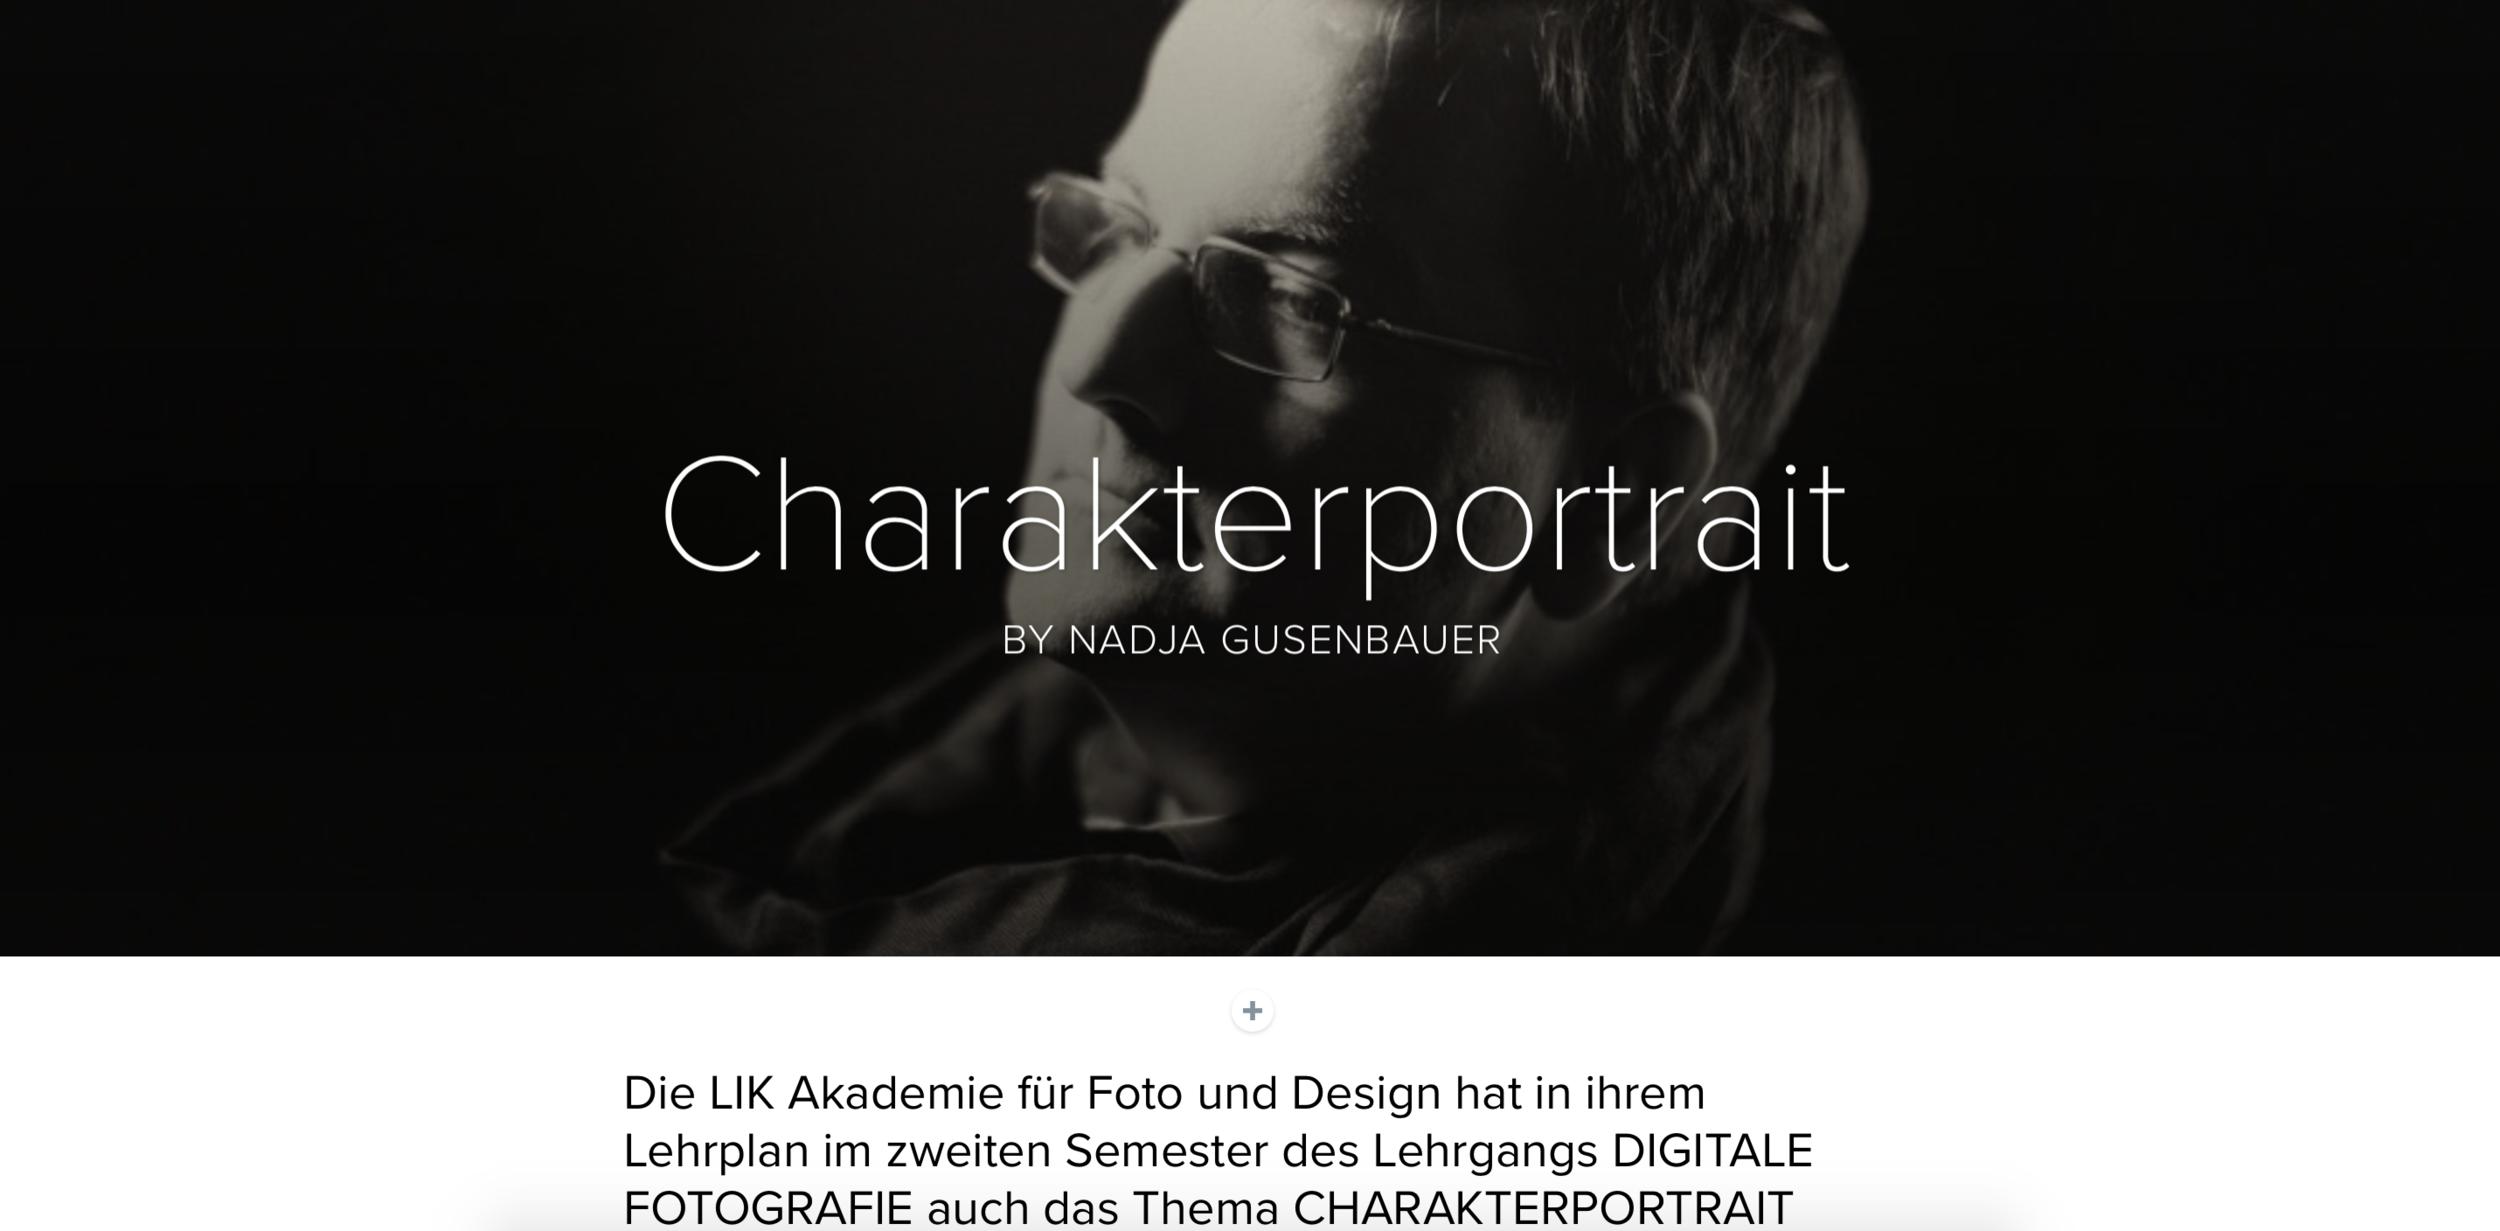 CHARAKTERPORTRAIT - by Nadja Gusenbauer